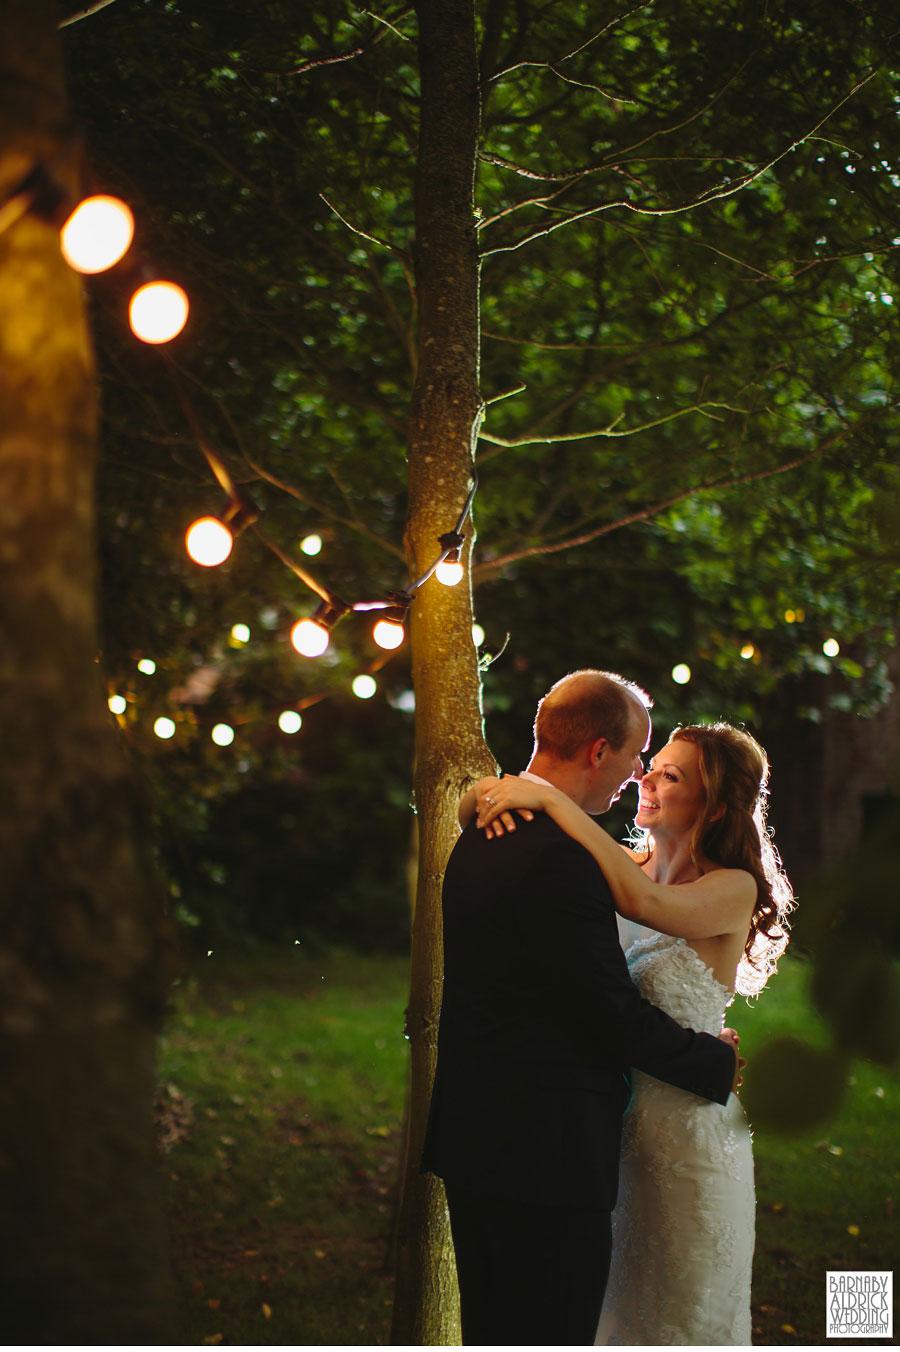 Shustoke Farm Barns Wedding Photography, Shustoke Barns Wedding Photographer, Cripps Barn Solihull Birmingham Wedding, 044